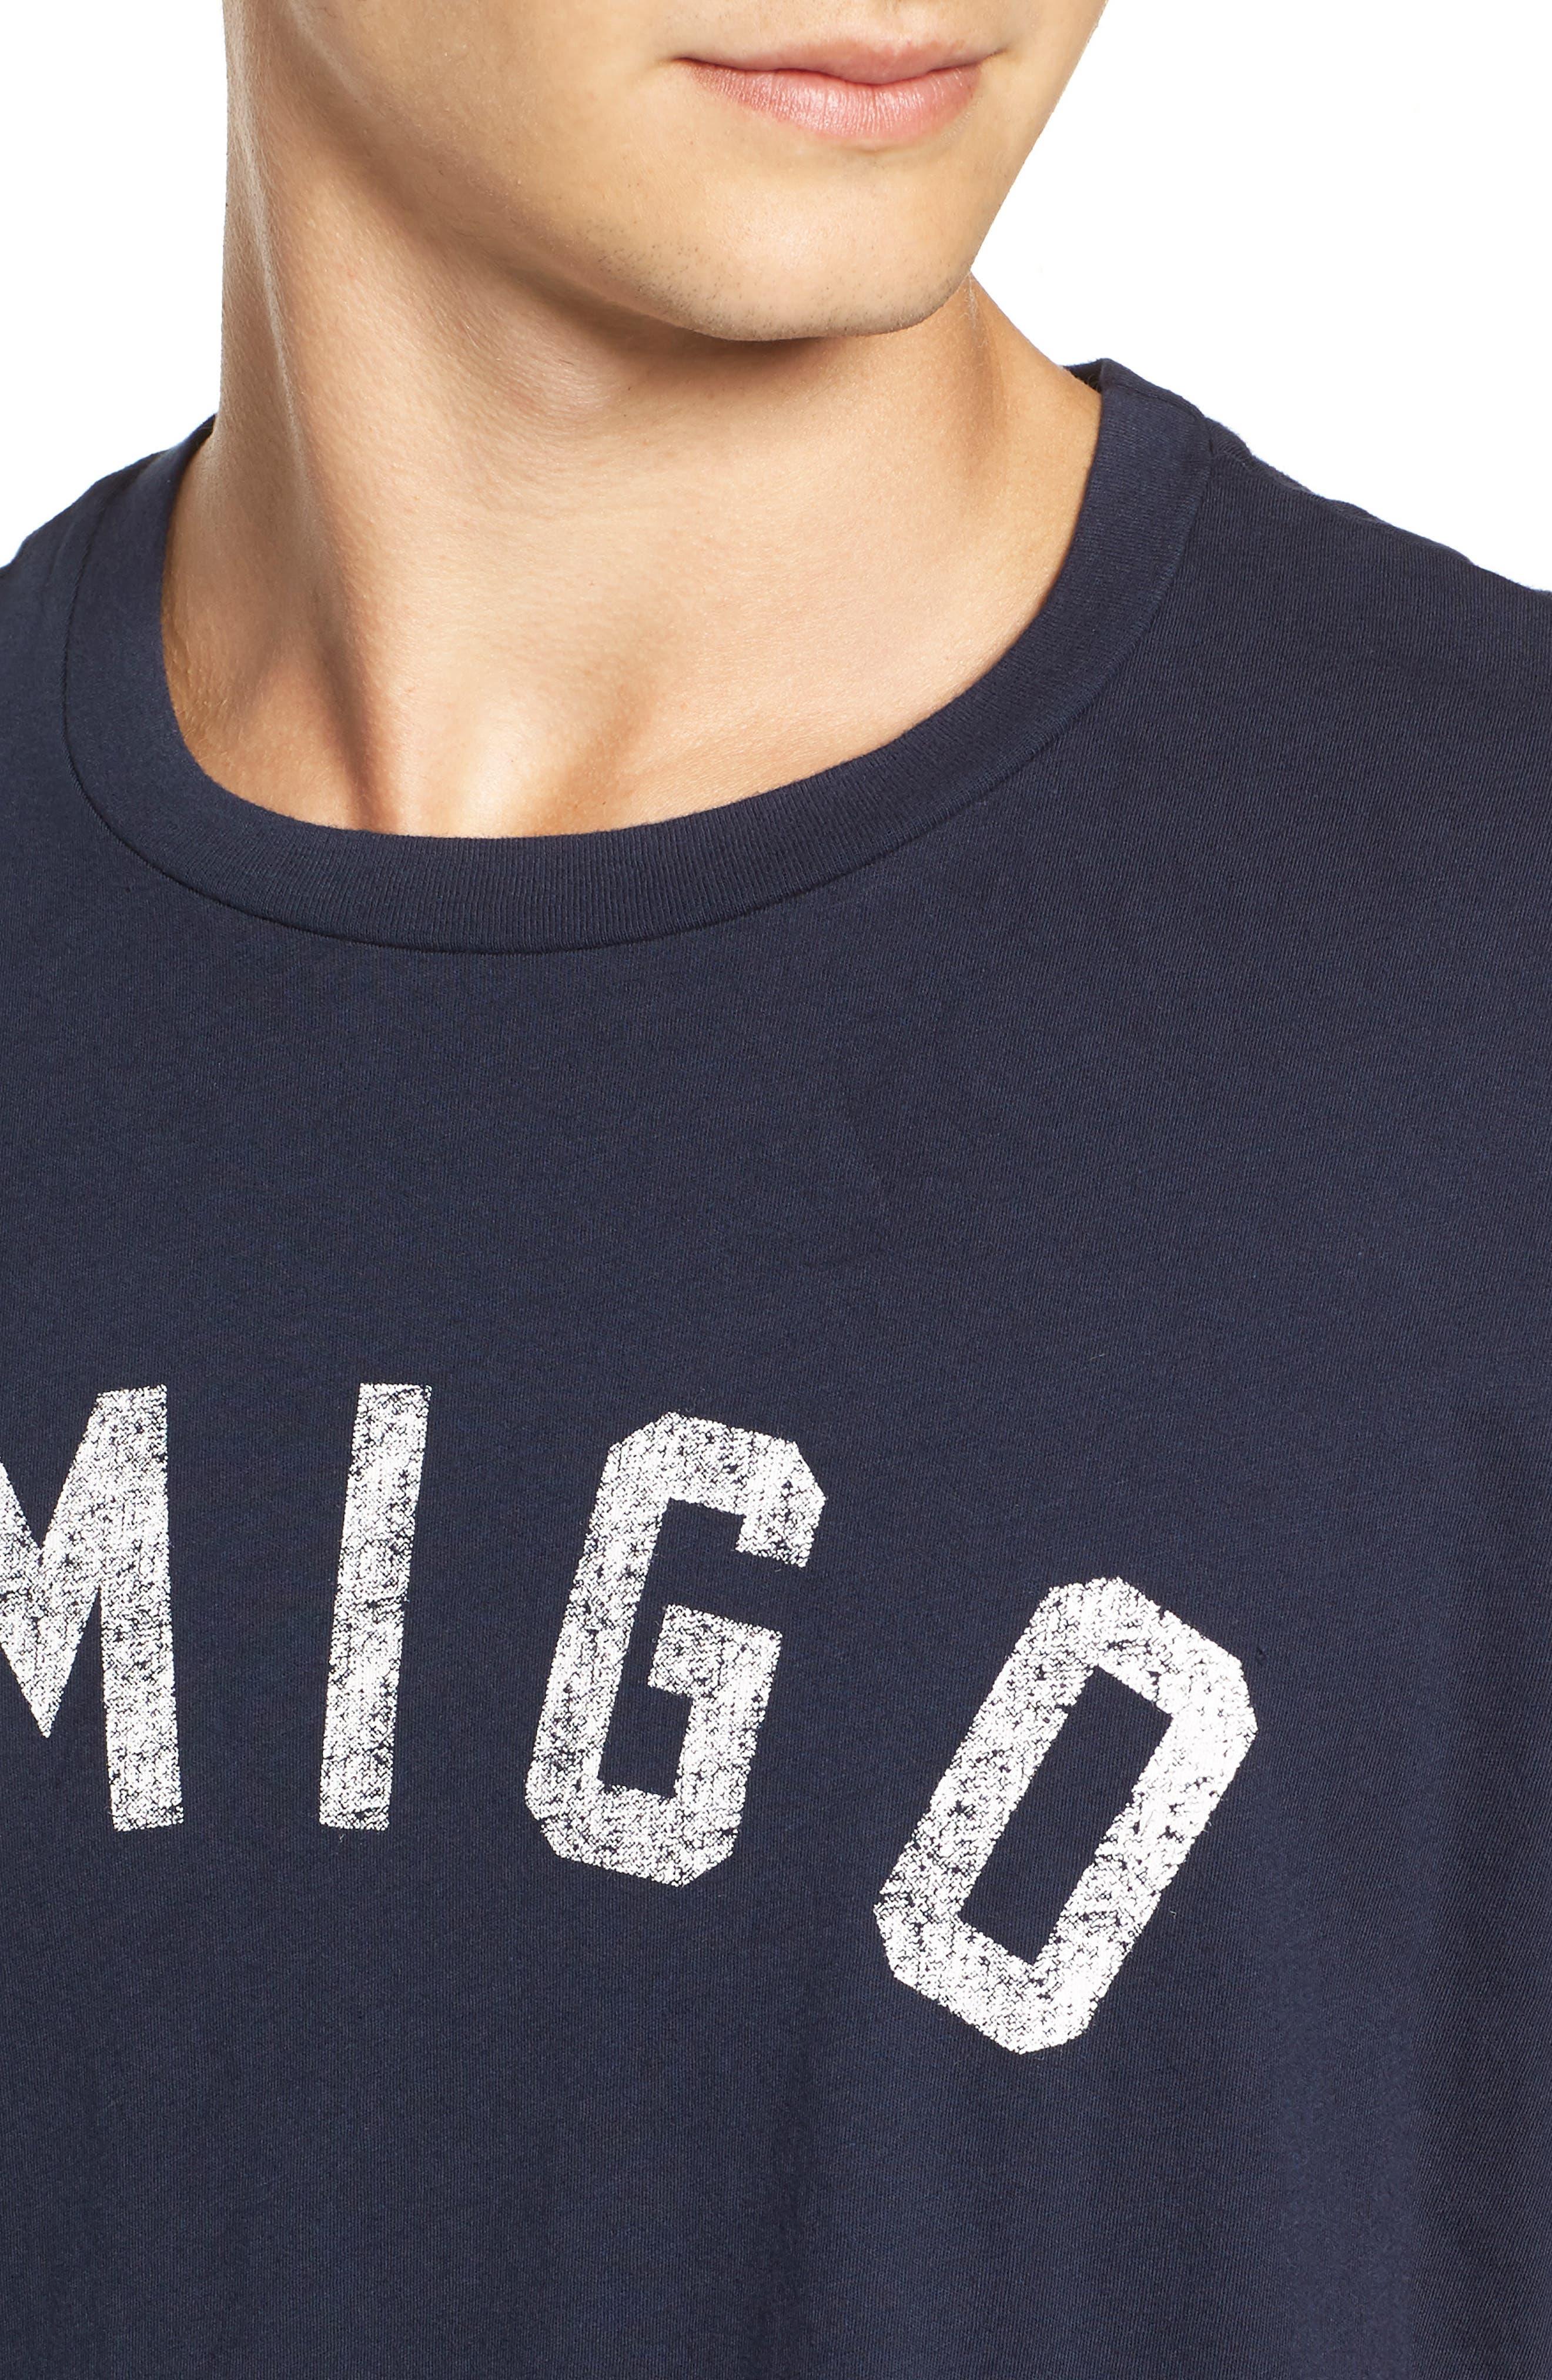 Amigo Graphic T-Shirt,                             Alternate thumbnail 4, color,                             400